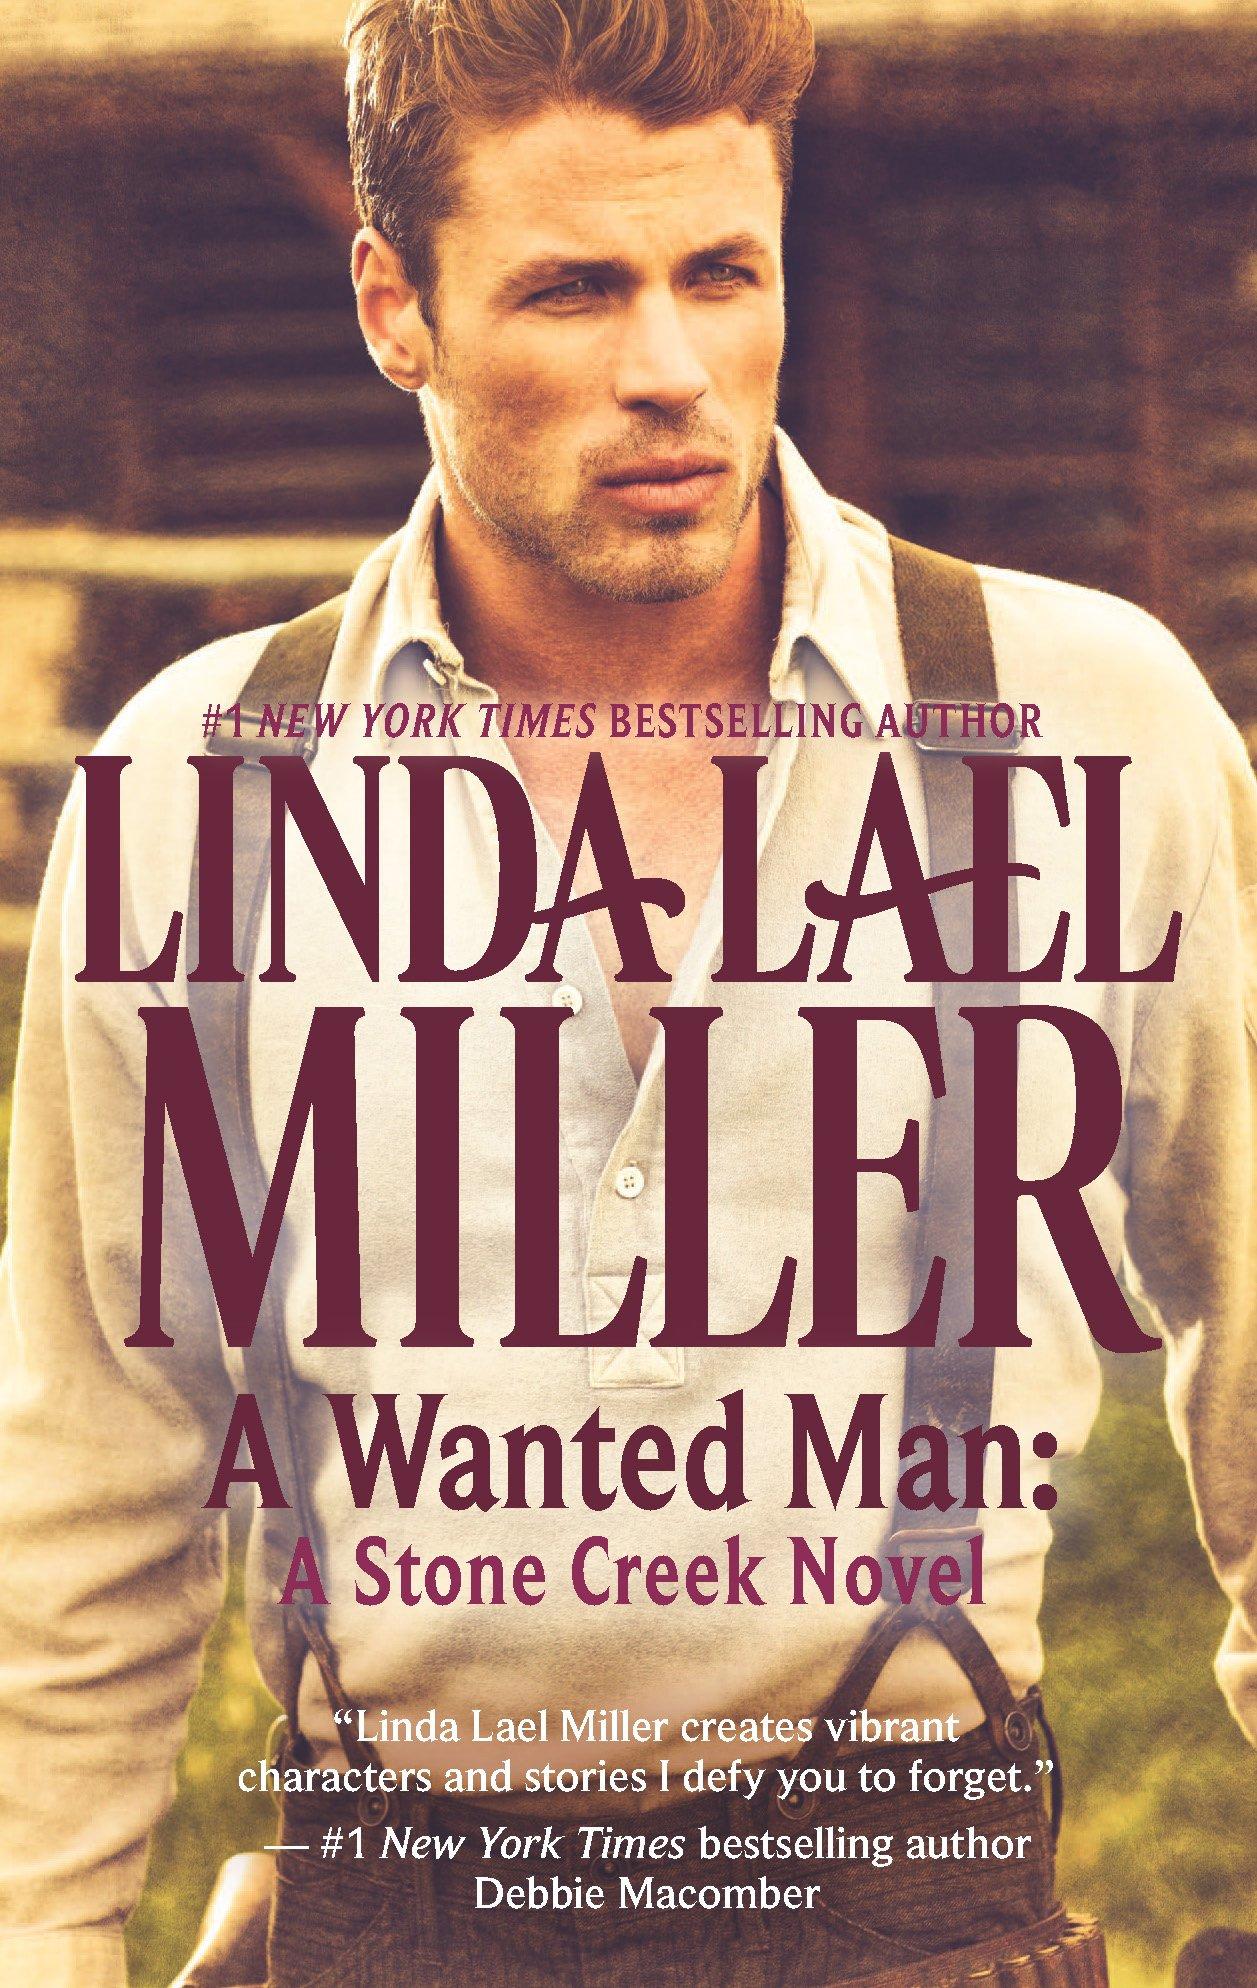 A Wanted Man: A Stone Creek Novel PDF